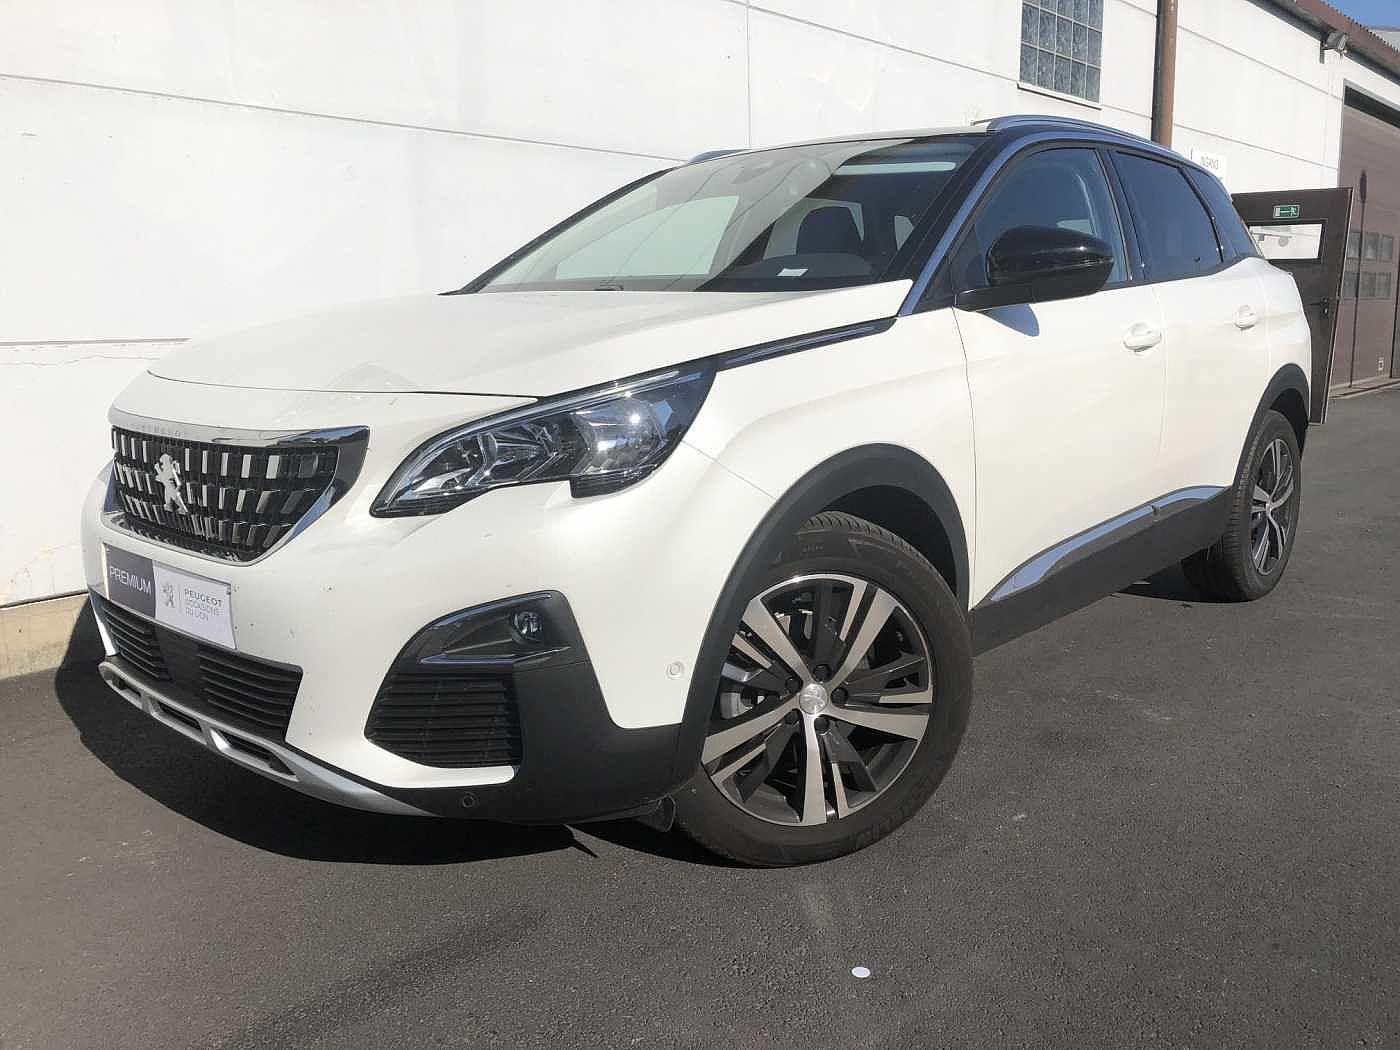 Peugeot 1.2 PureTech Allure (EU6.2)